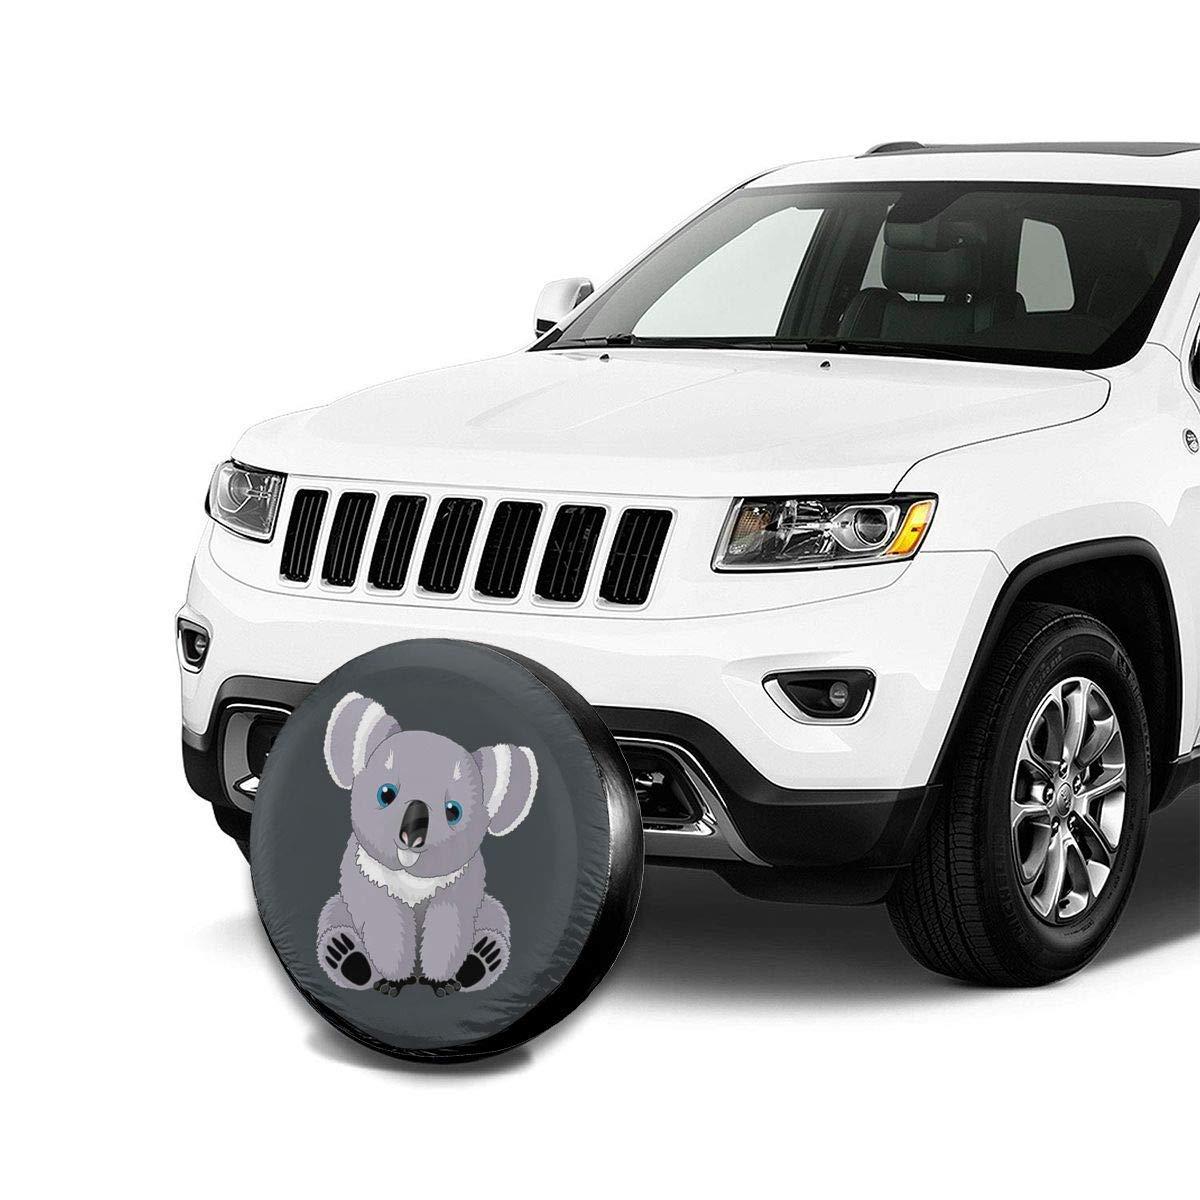 Xhayo Cute Australia Koala Bear Wheel Cover Wheelcover Spare Tyre Tire for SUV,RV,Trailer,Truck Wheel Fits Entire Wheel